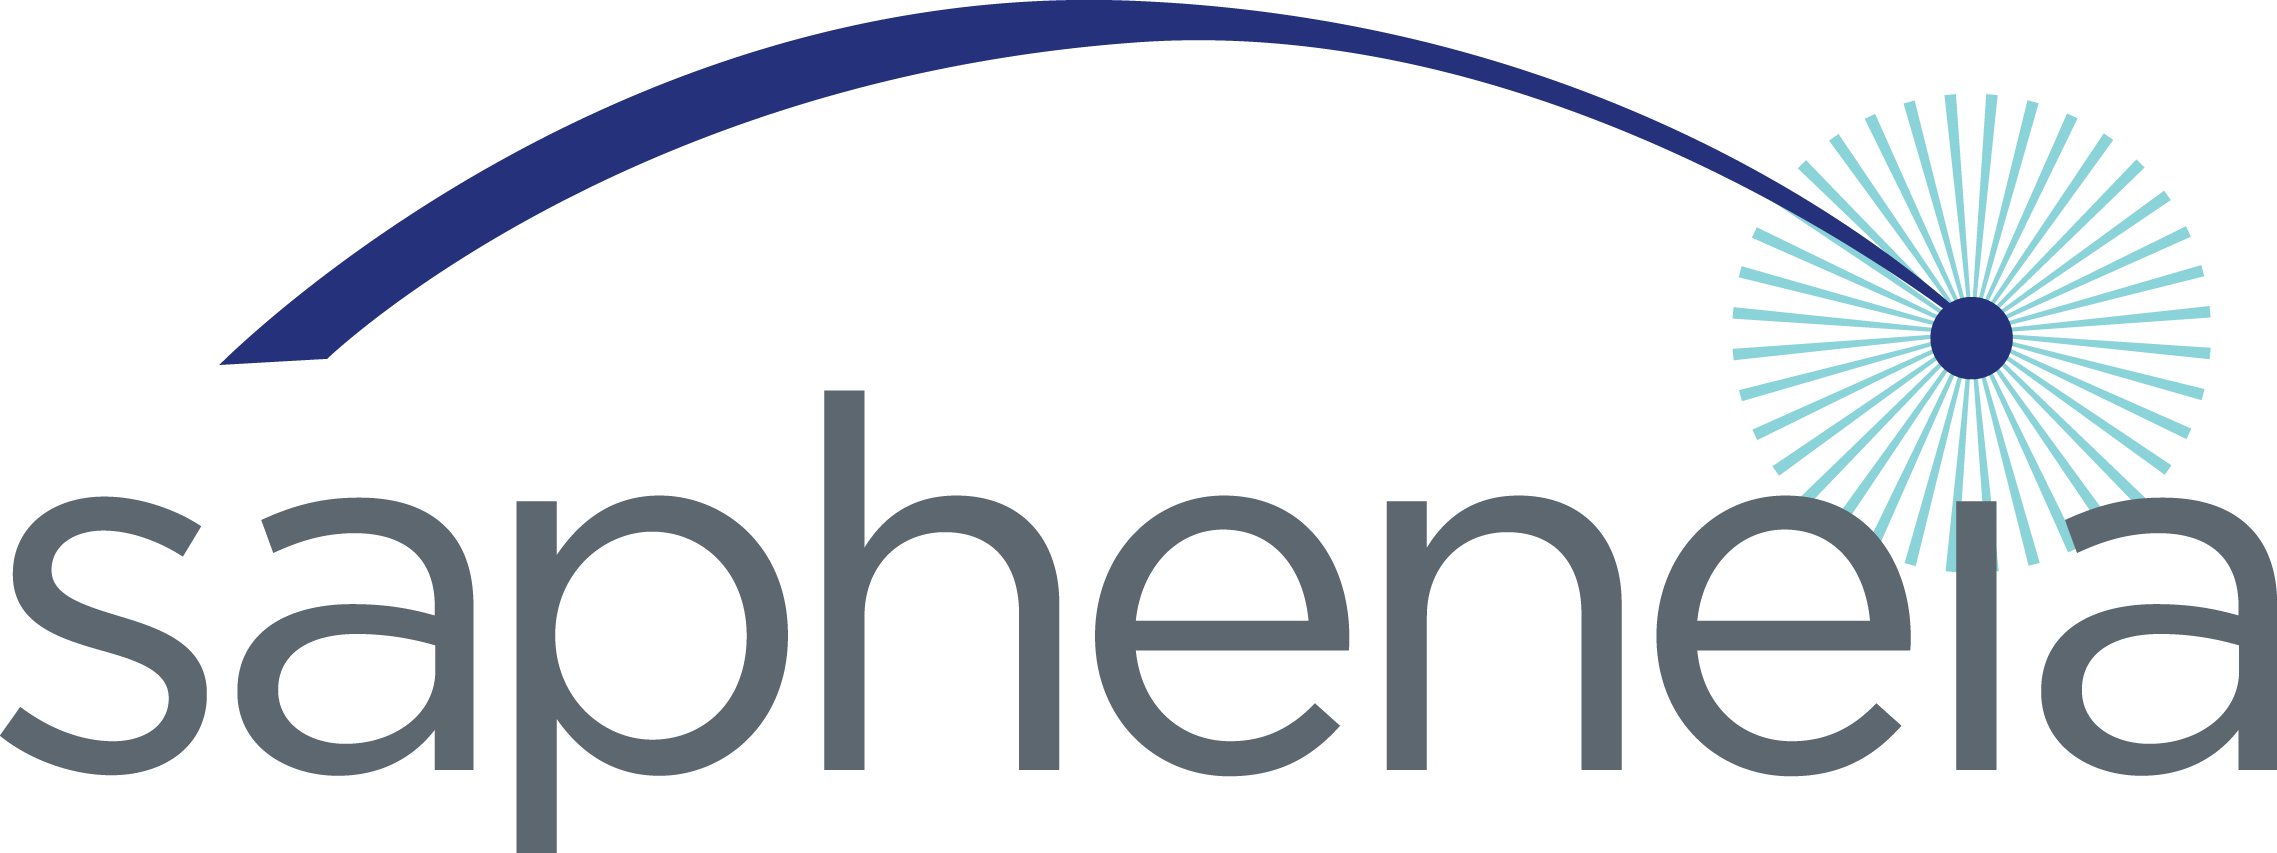 Sapheneia logo w arc